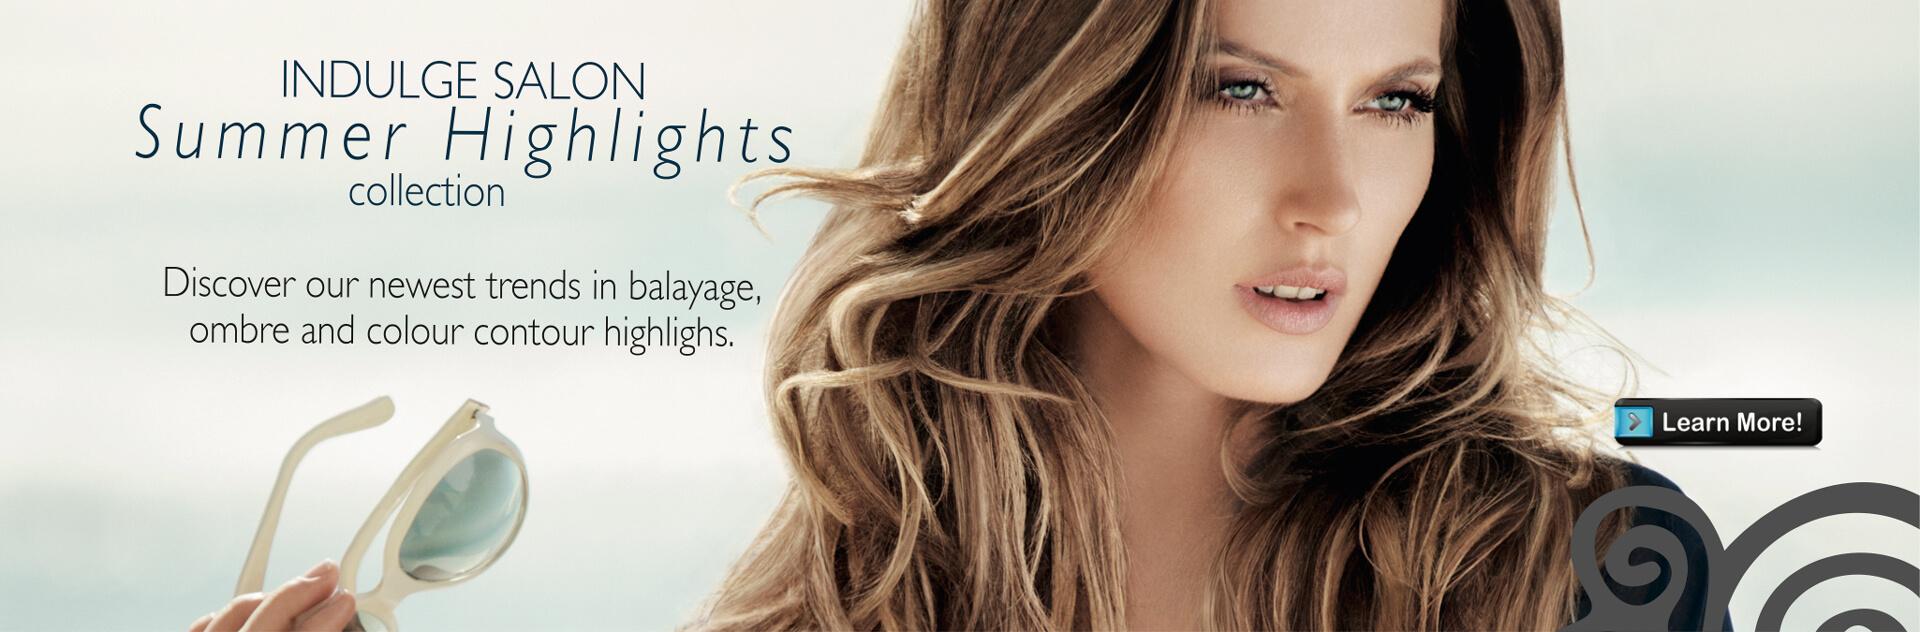 Professional Hair Styling York Pa Indulge Salon York Pa